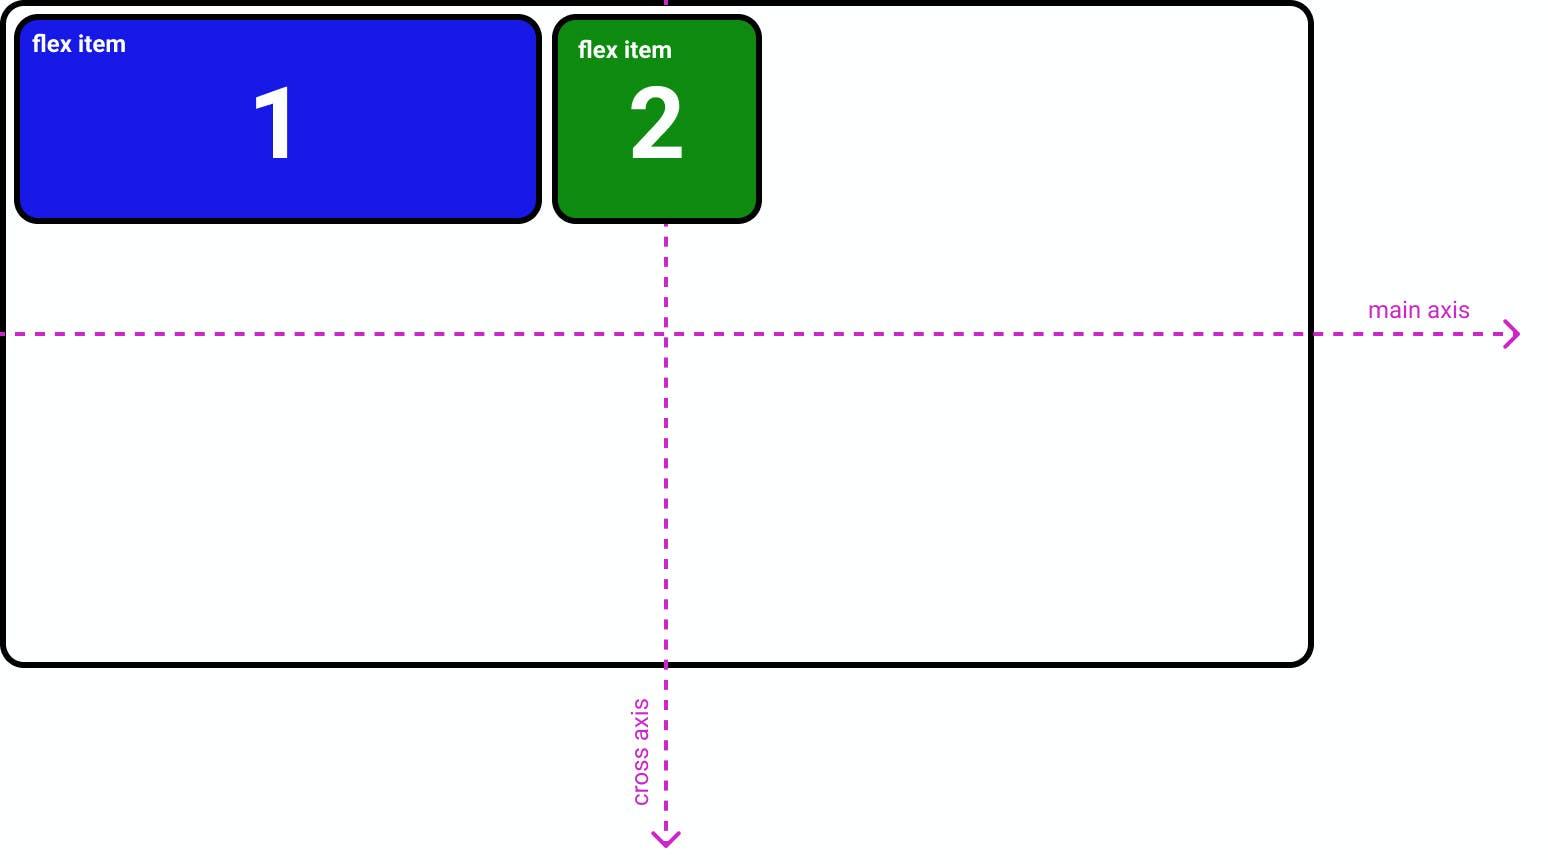 CSS flexbox flex-direction: row;